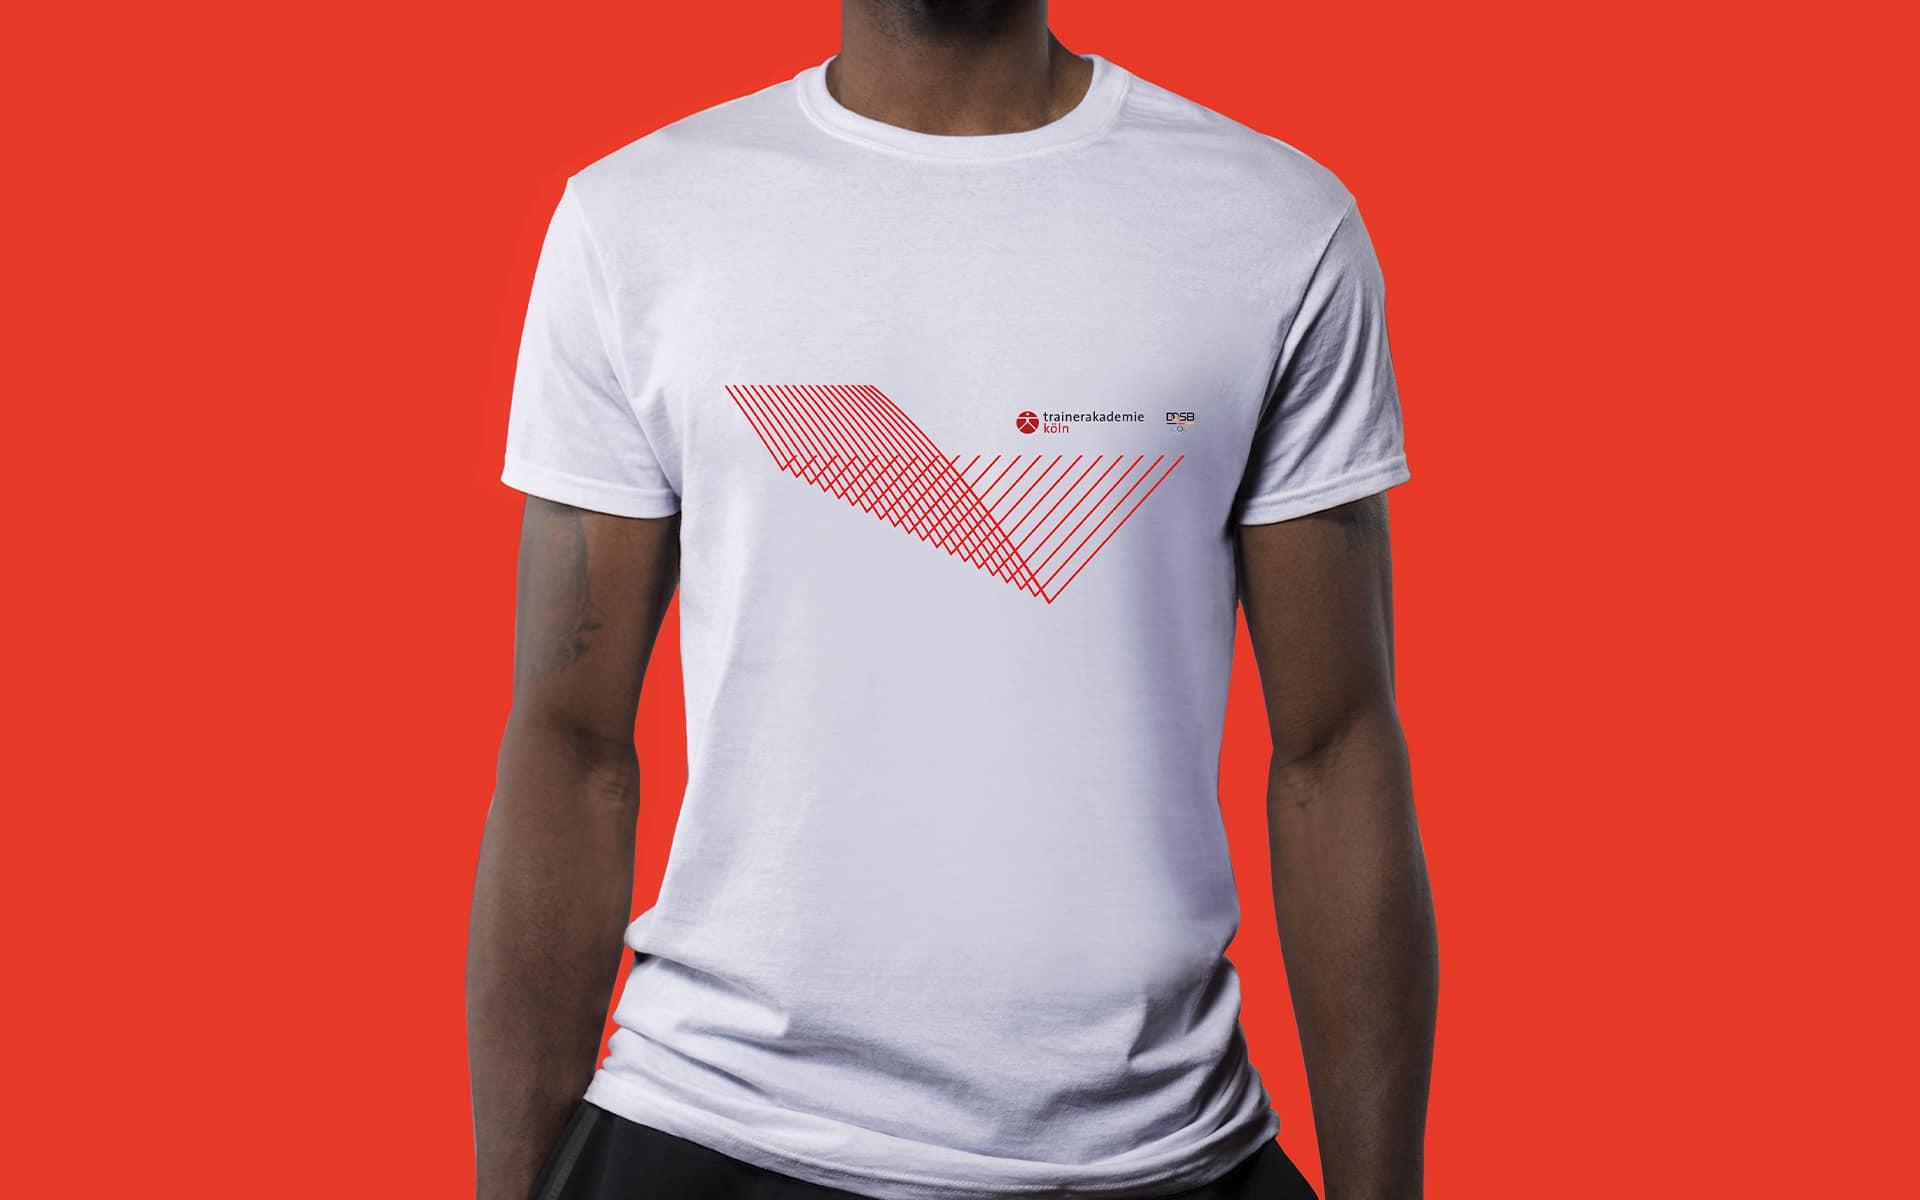 Trainerakademie Köln Corporate Design, T-Shirt-Branding